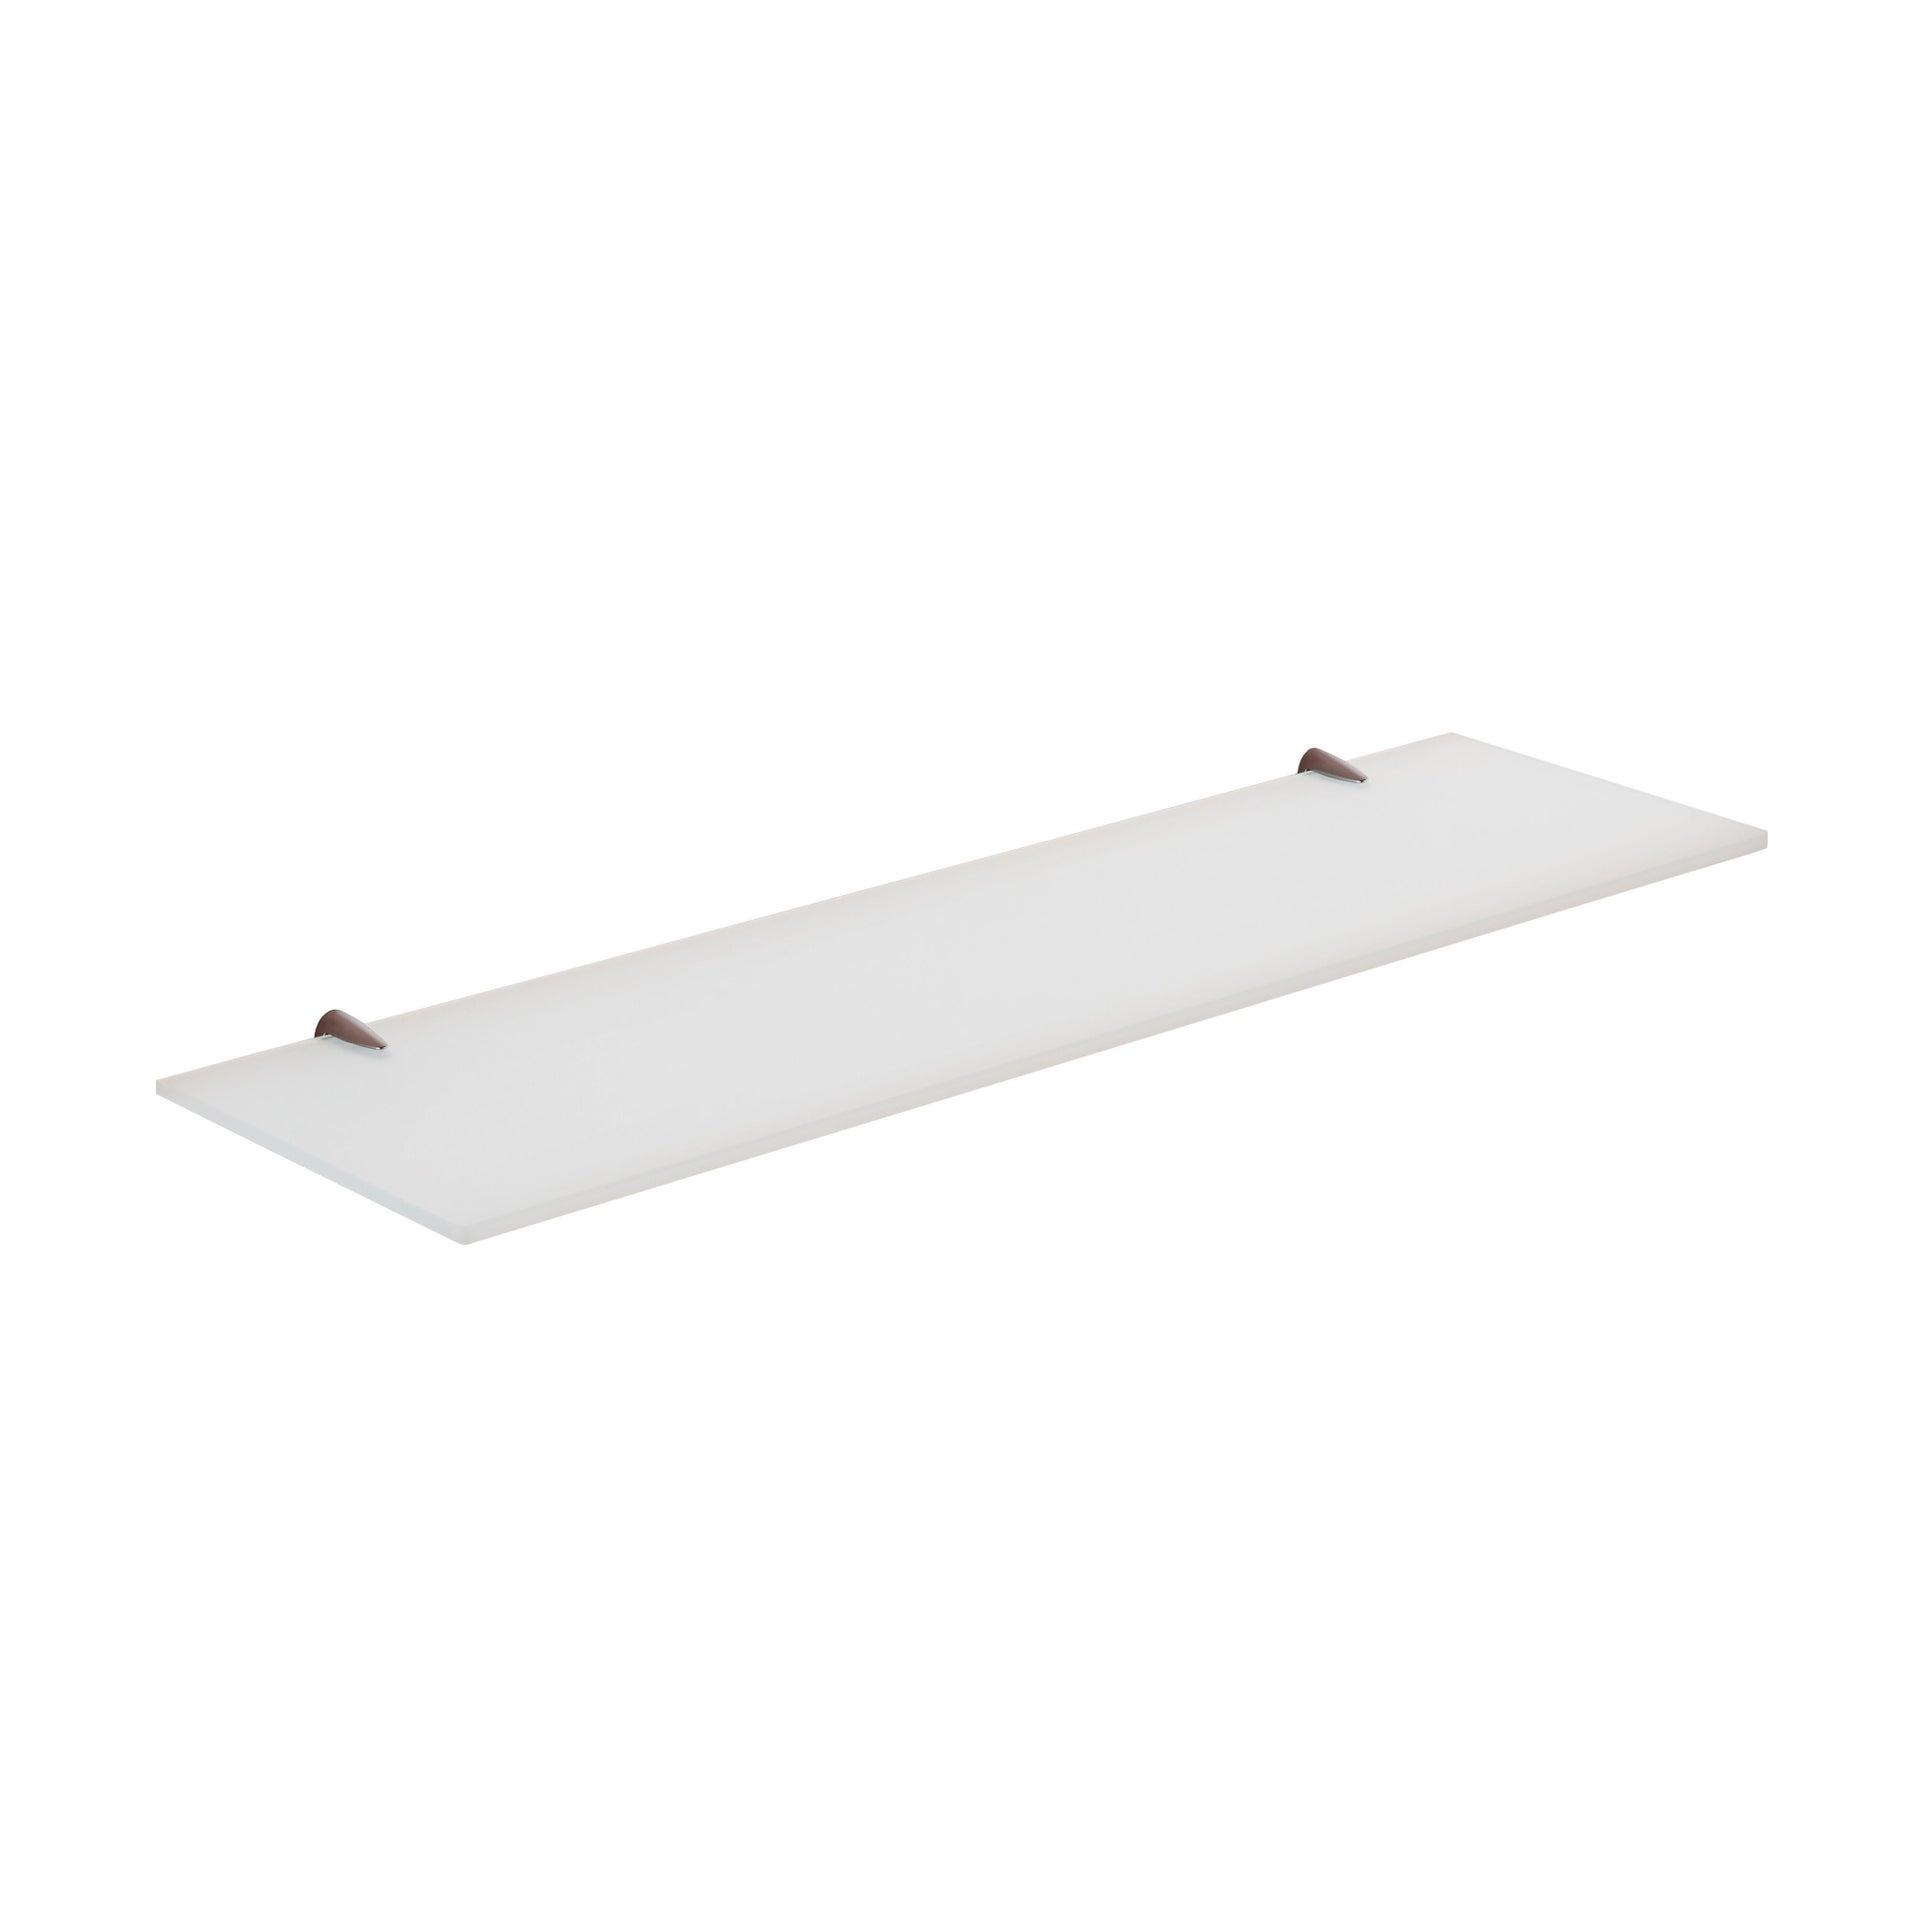 Mensola per bagno Artemis L 60 cm bianco